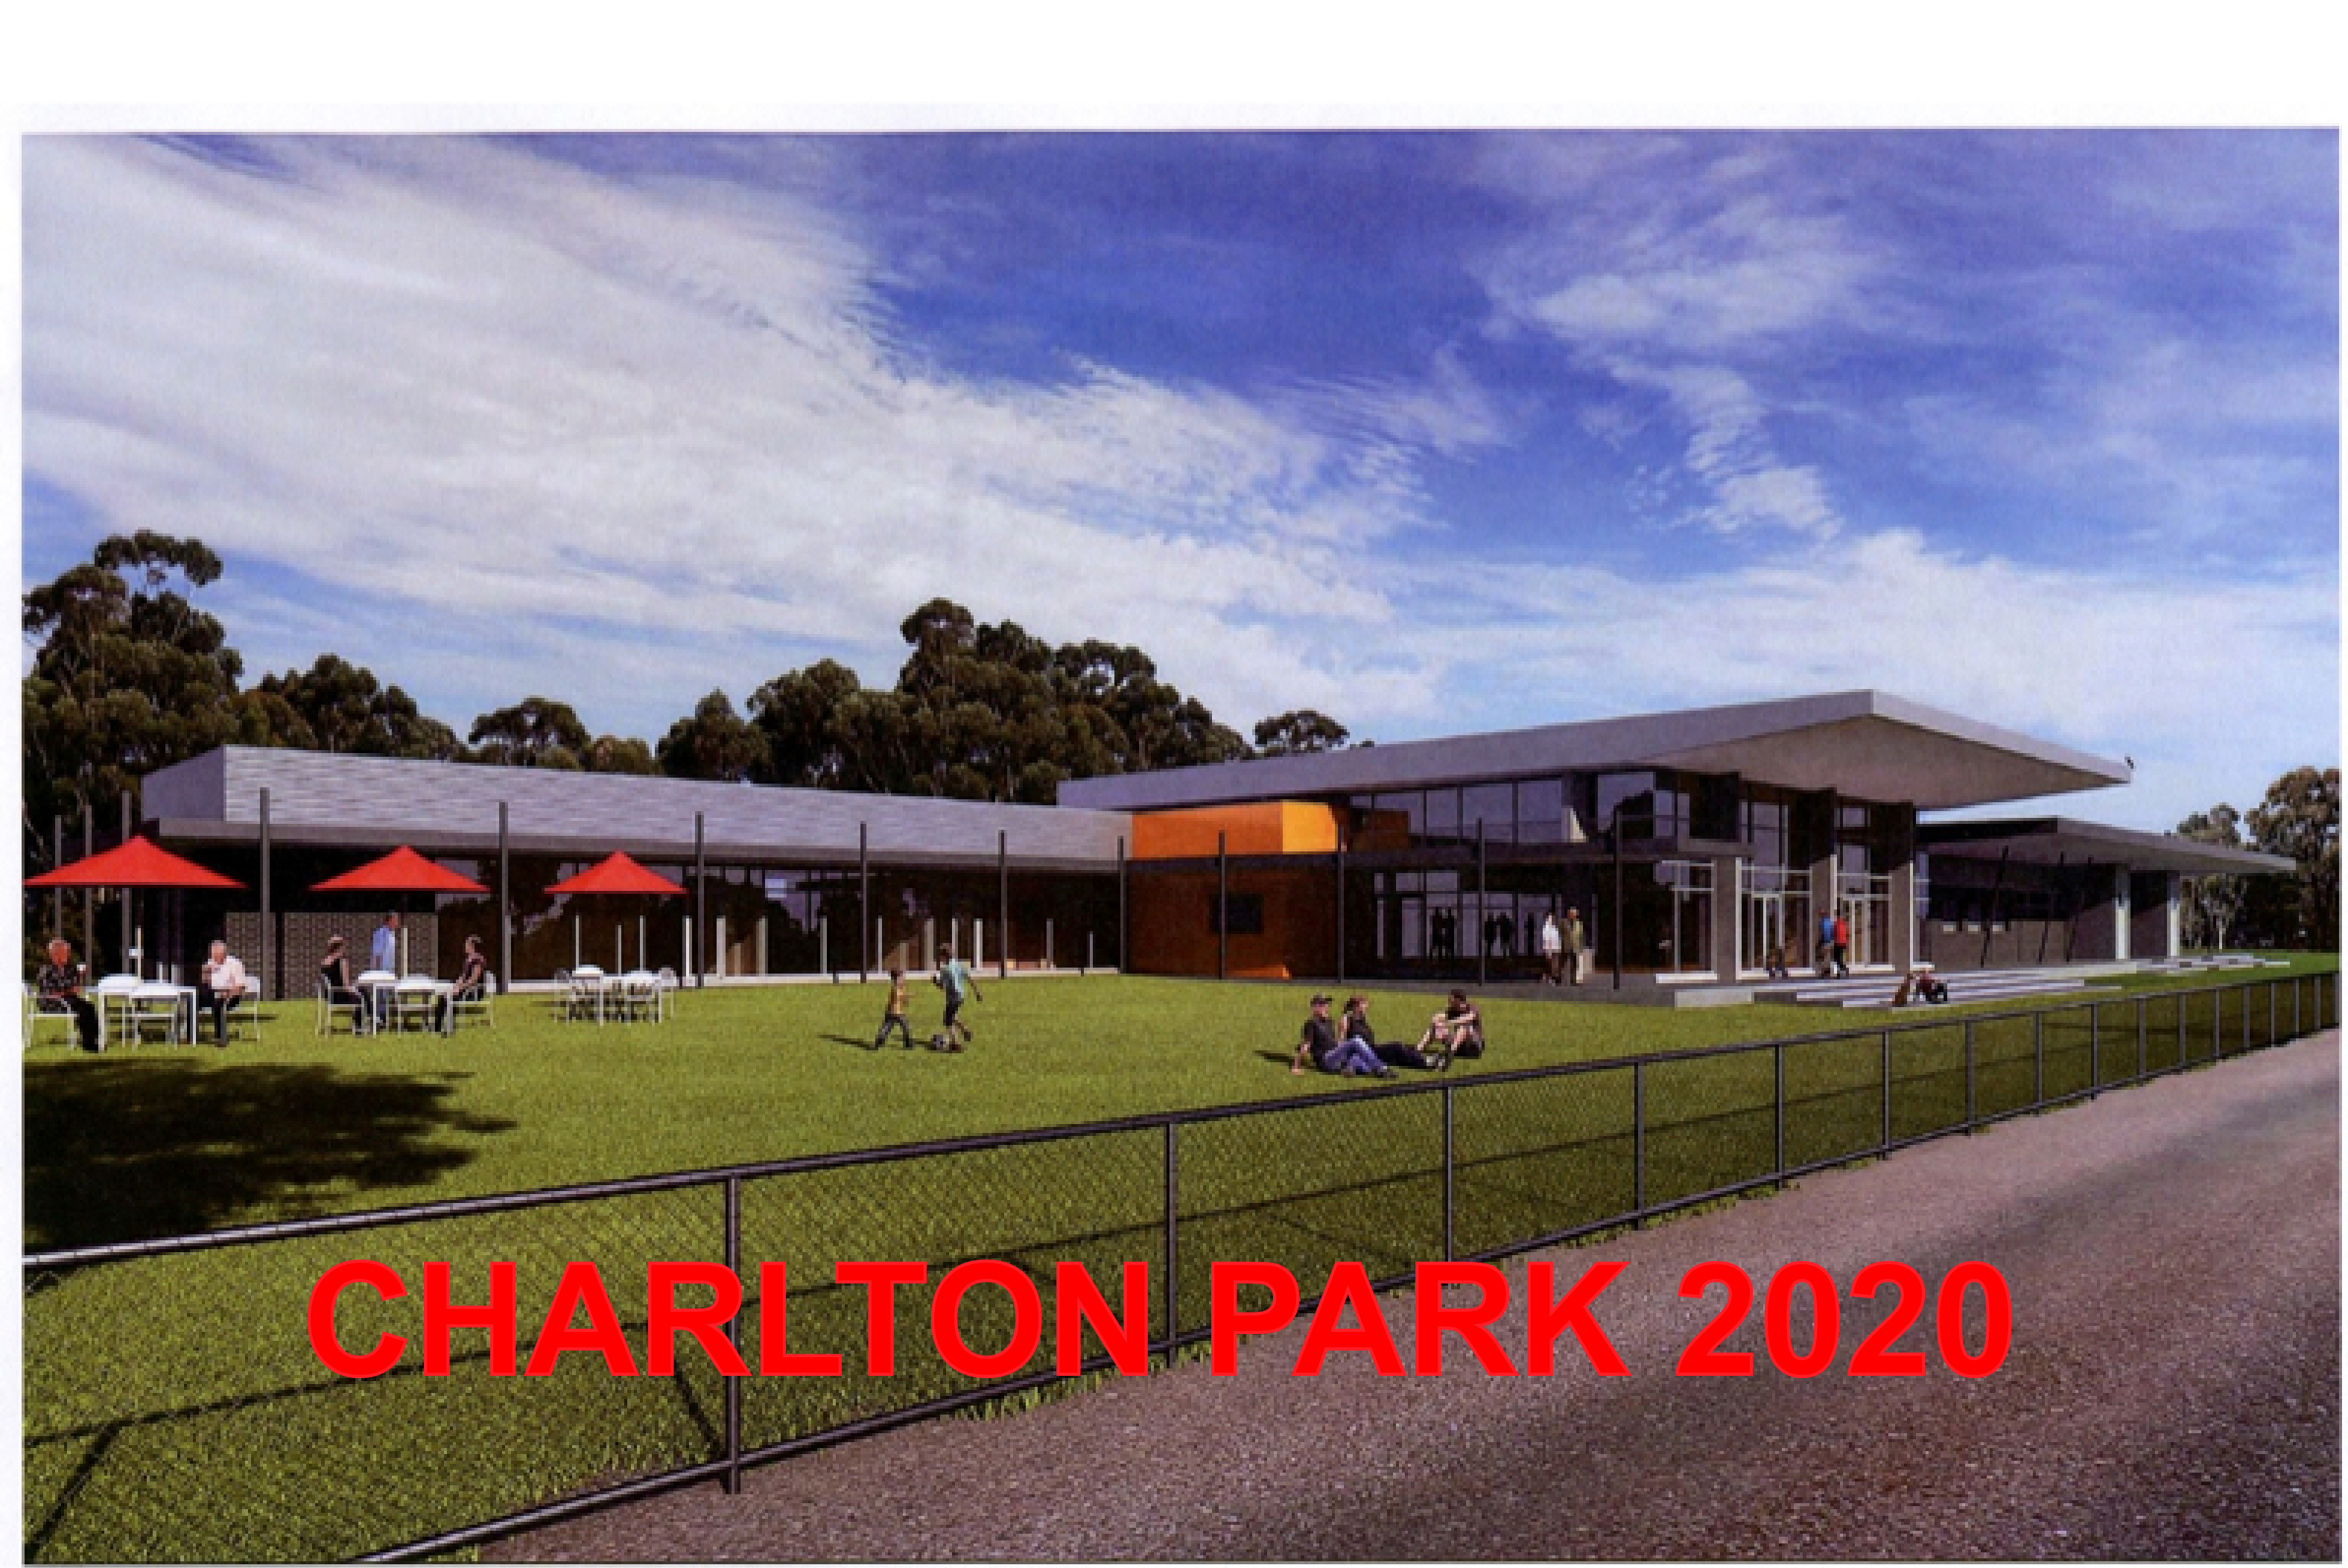 Charlton Park Multipurpose Facility